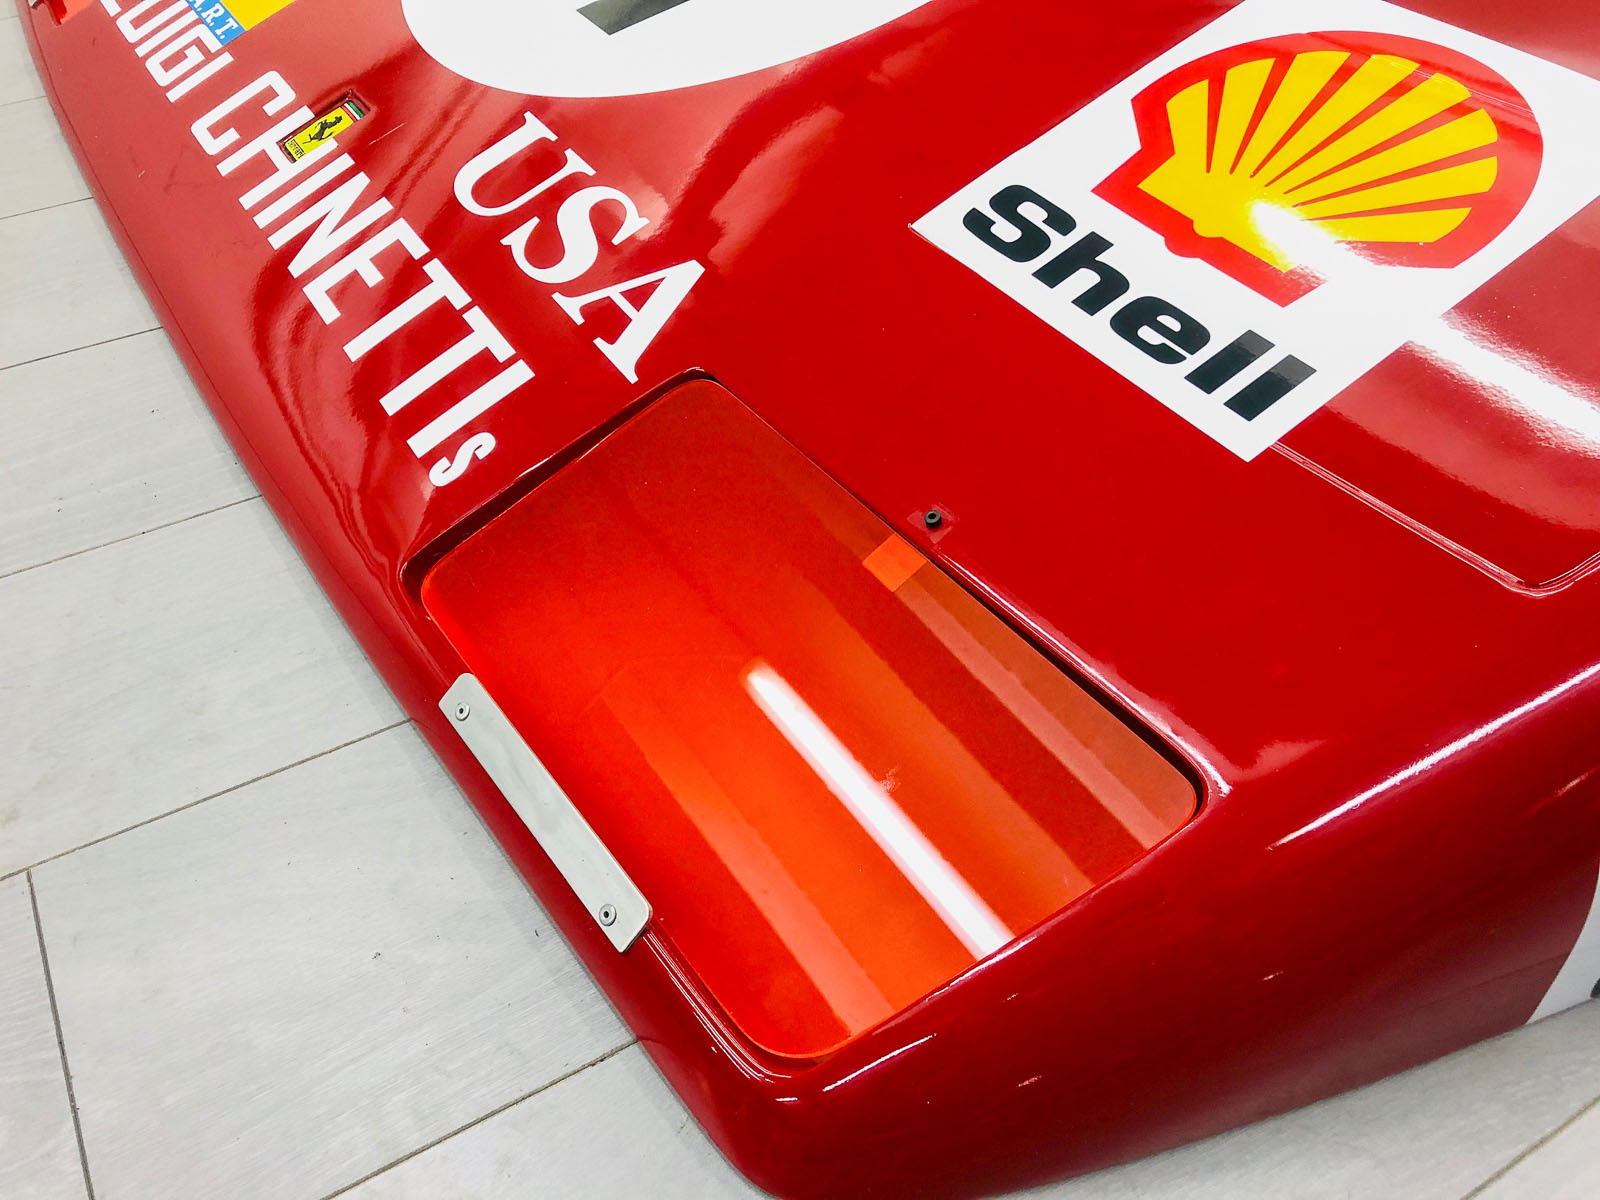 1978 Ferrari 512 - Oldtimer zu verkaufen